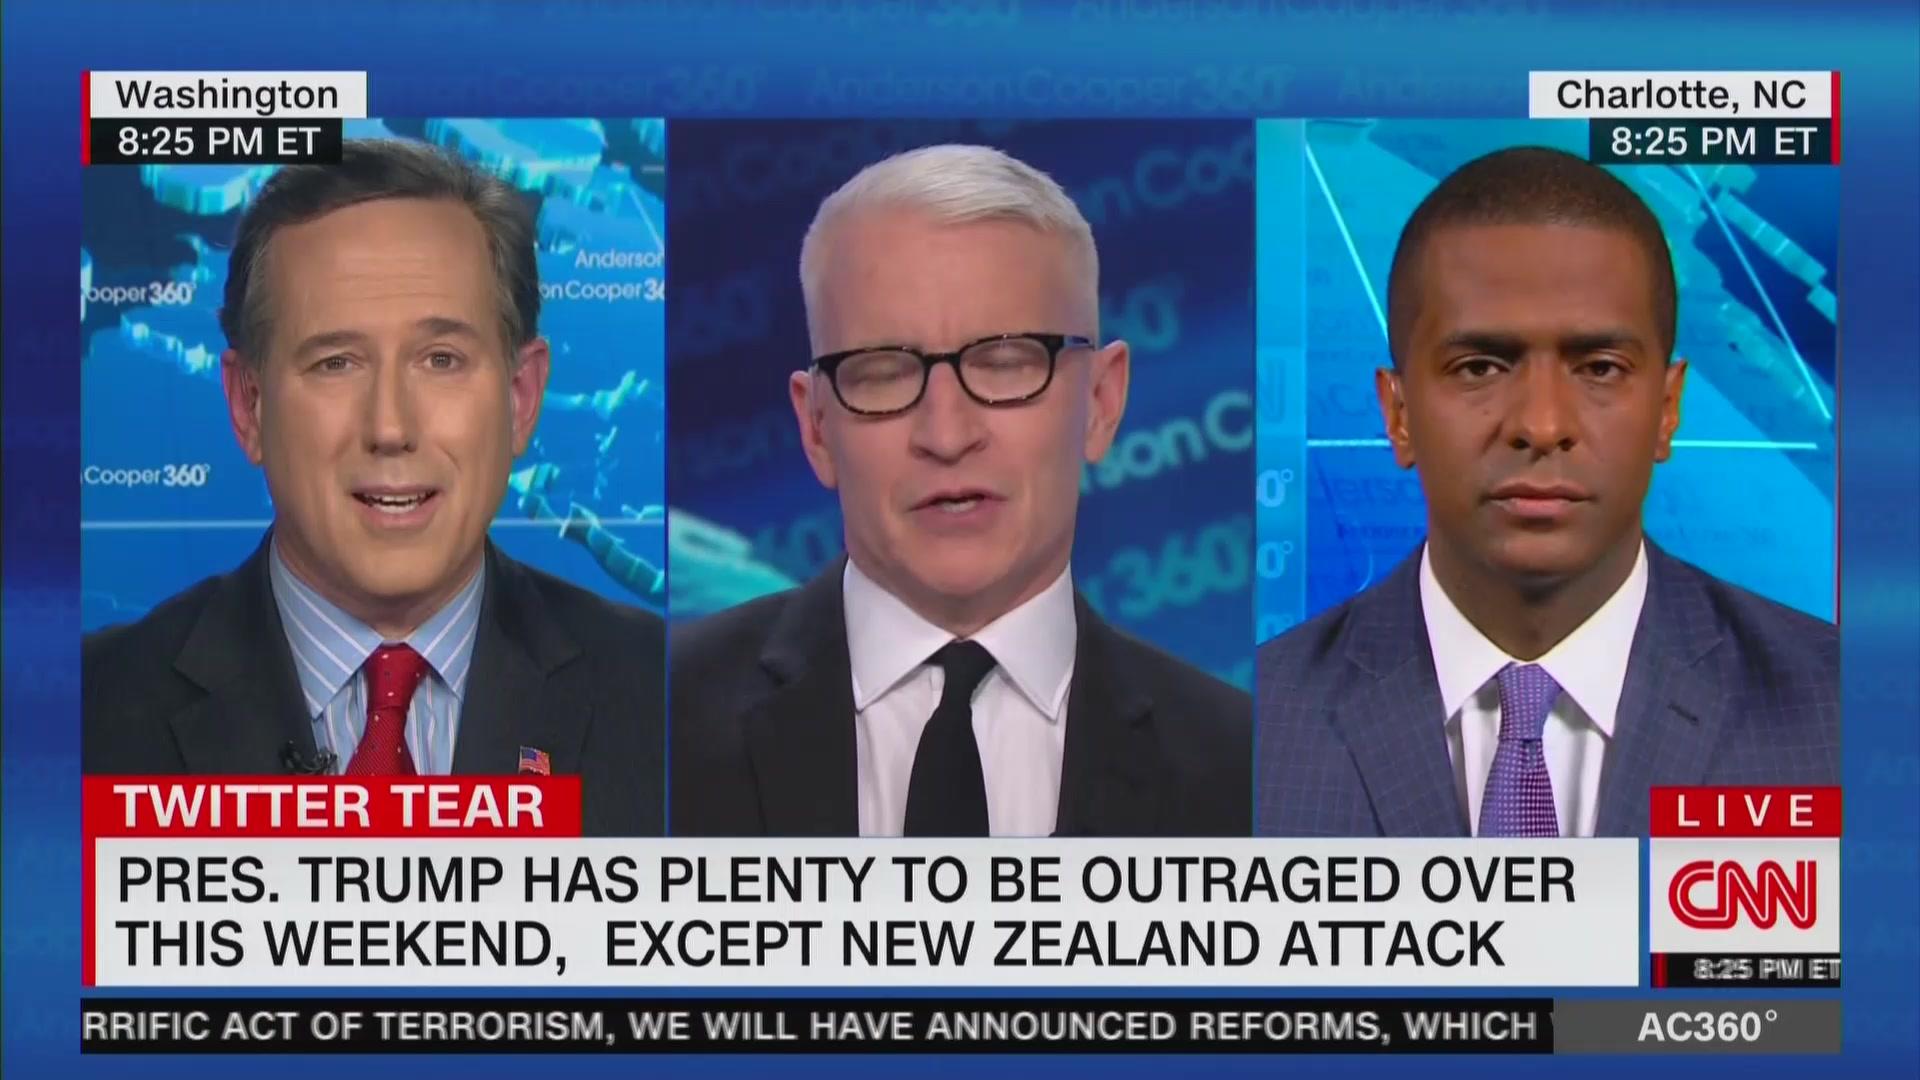 Rick Santorum: I Wish President Trump Would Email a Therapist Instead of Tweet